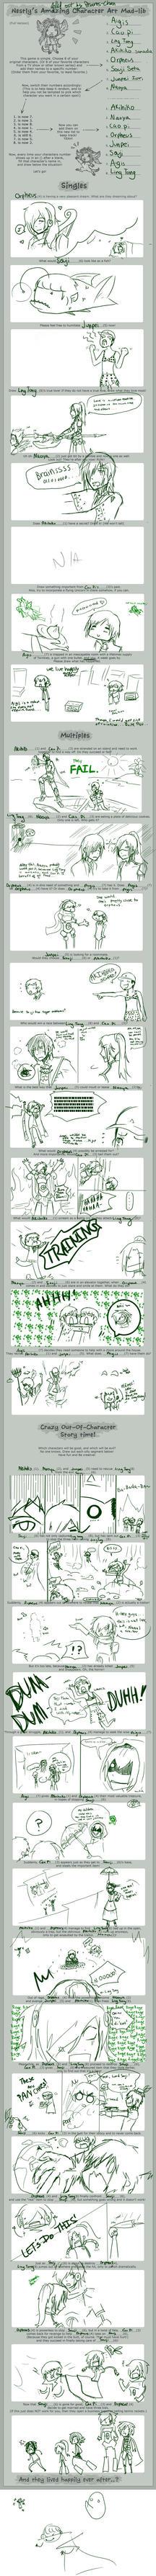 Character Art Mad-Lib by Pharos-Chan